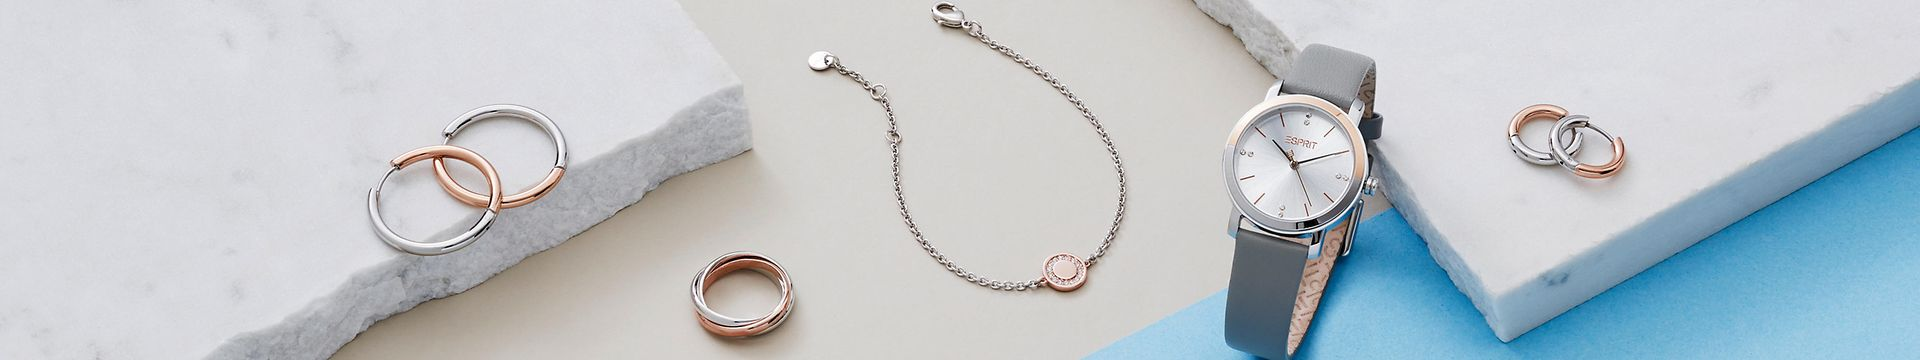 222021 - women - accessories - tc banner - Schmuck - IMG